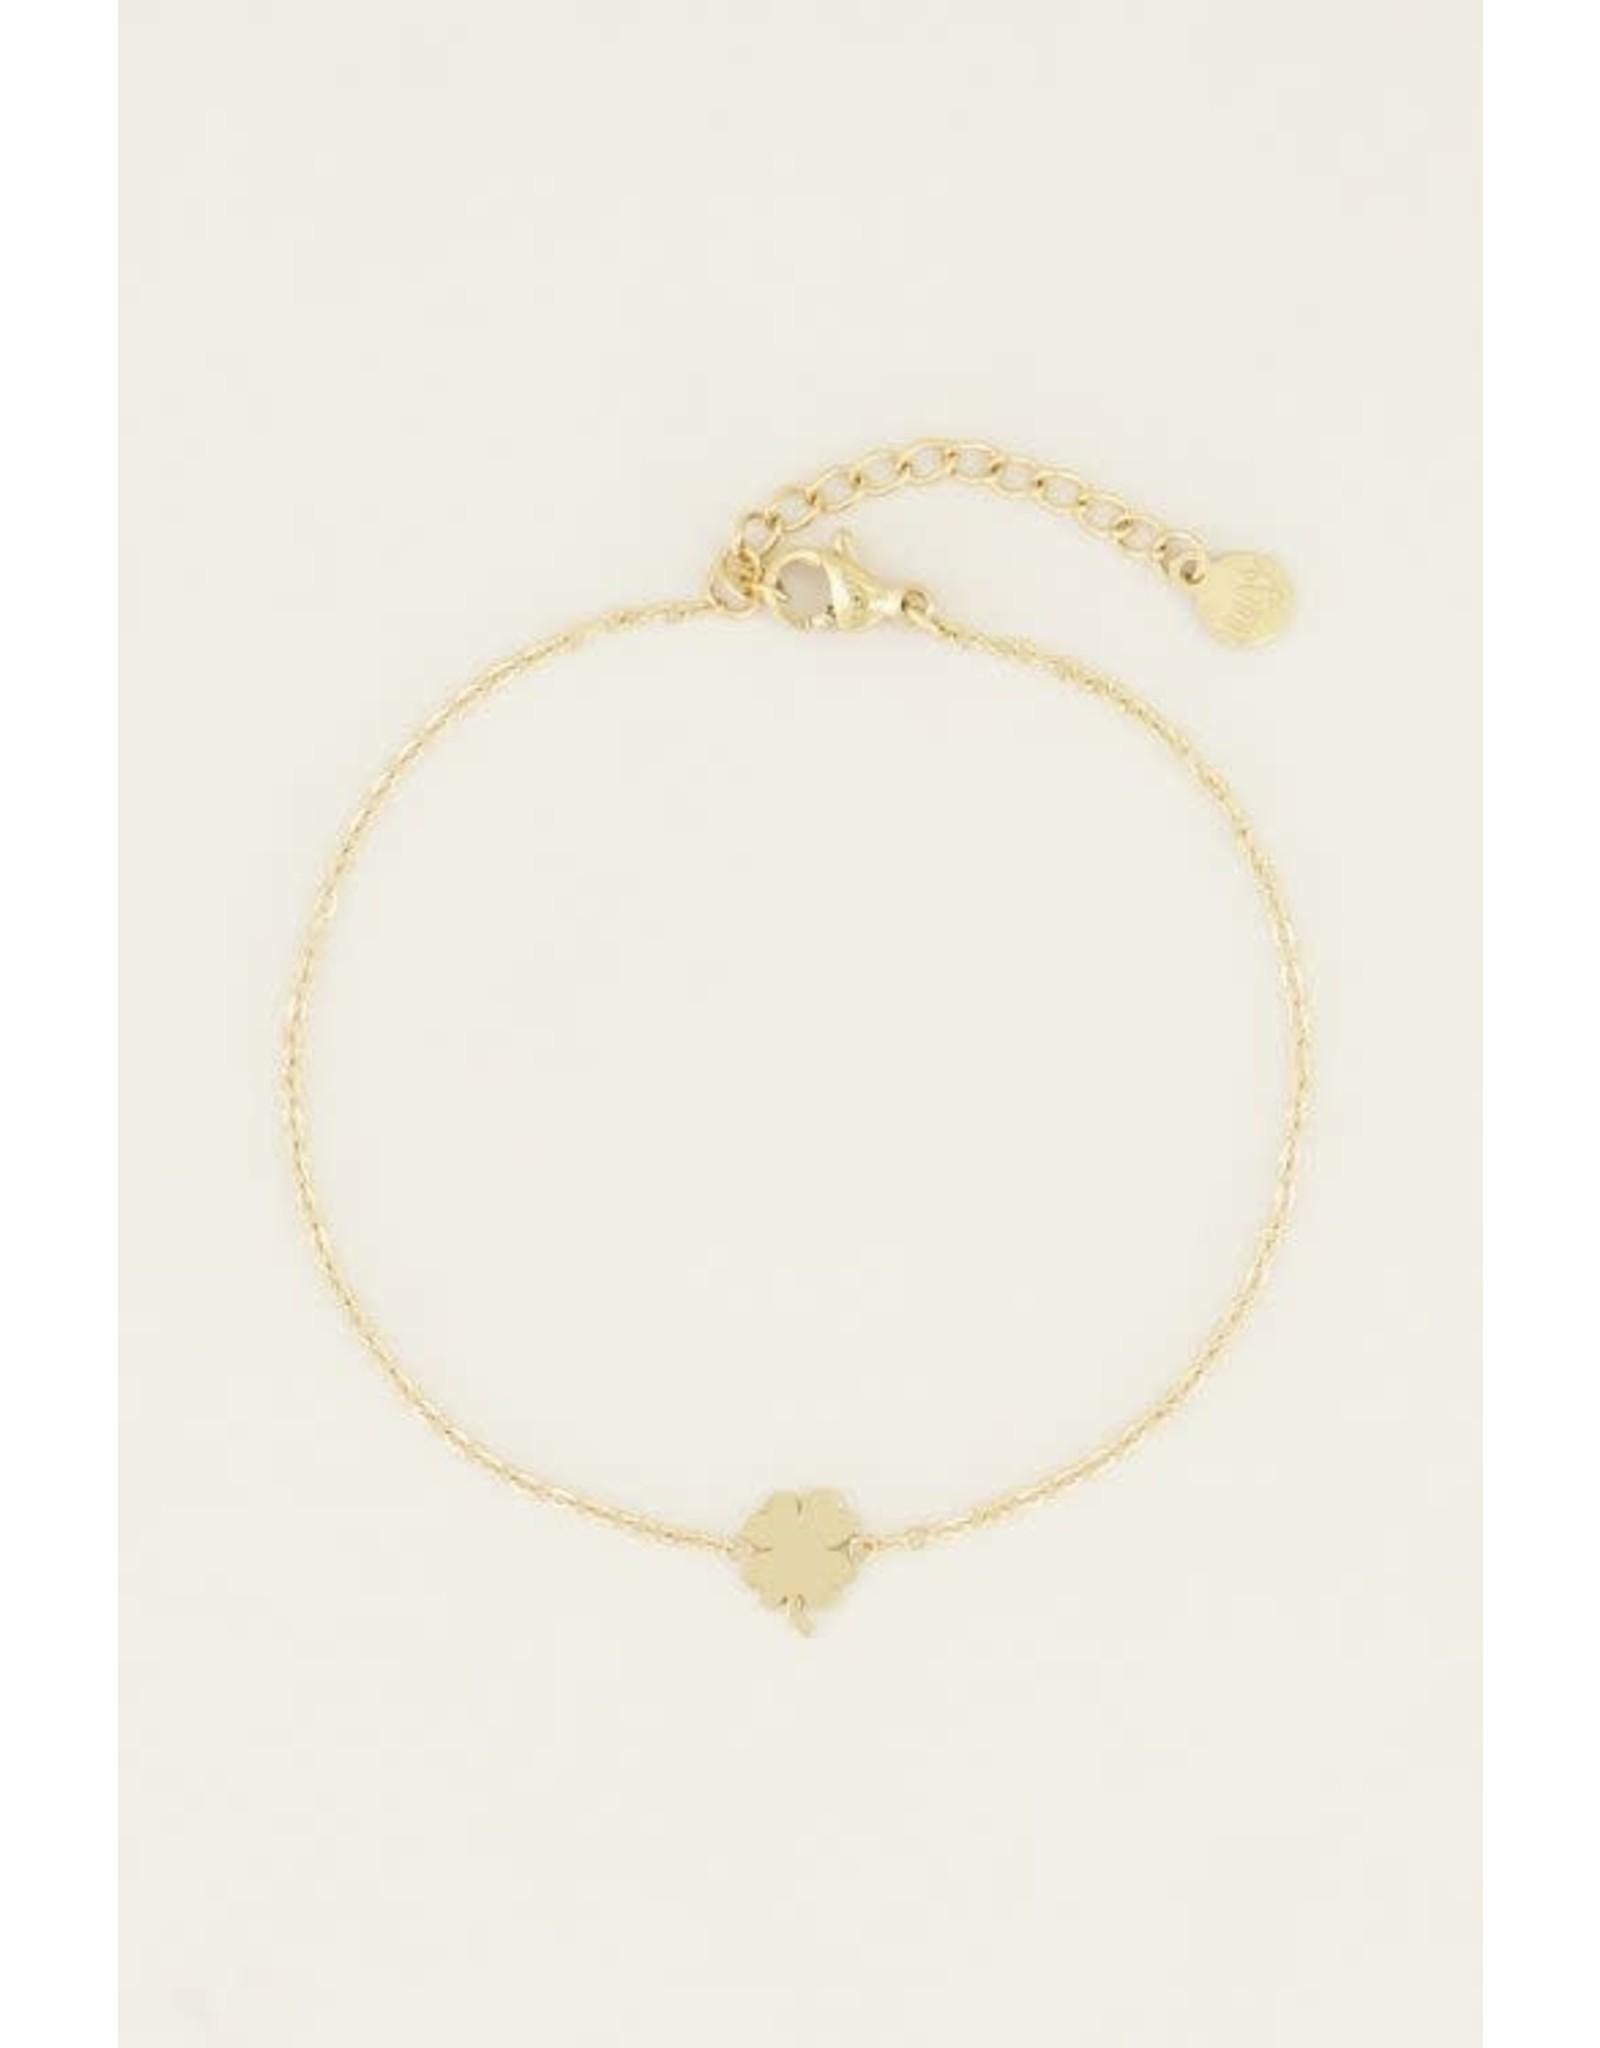 My Jewellery My Jewellery armband - klaver